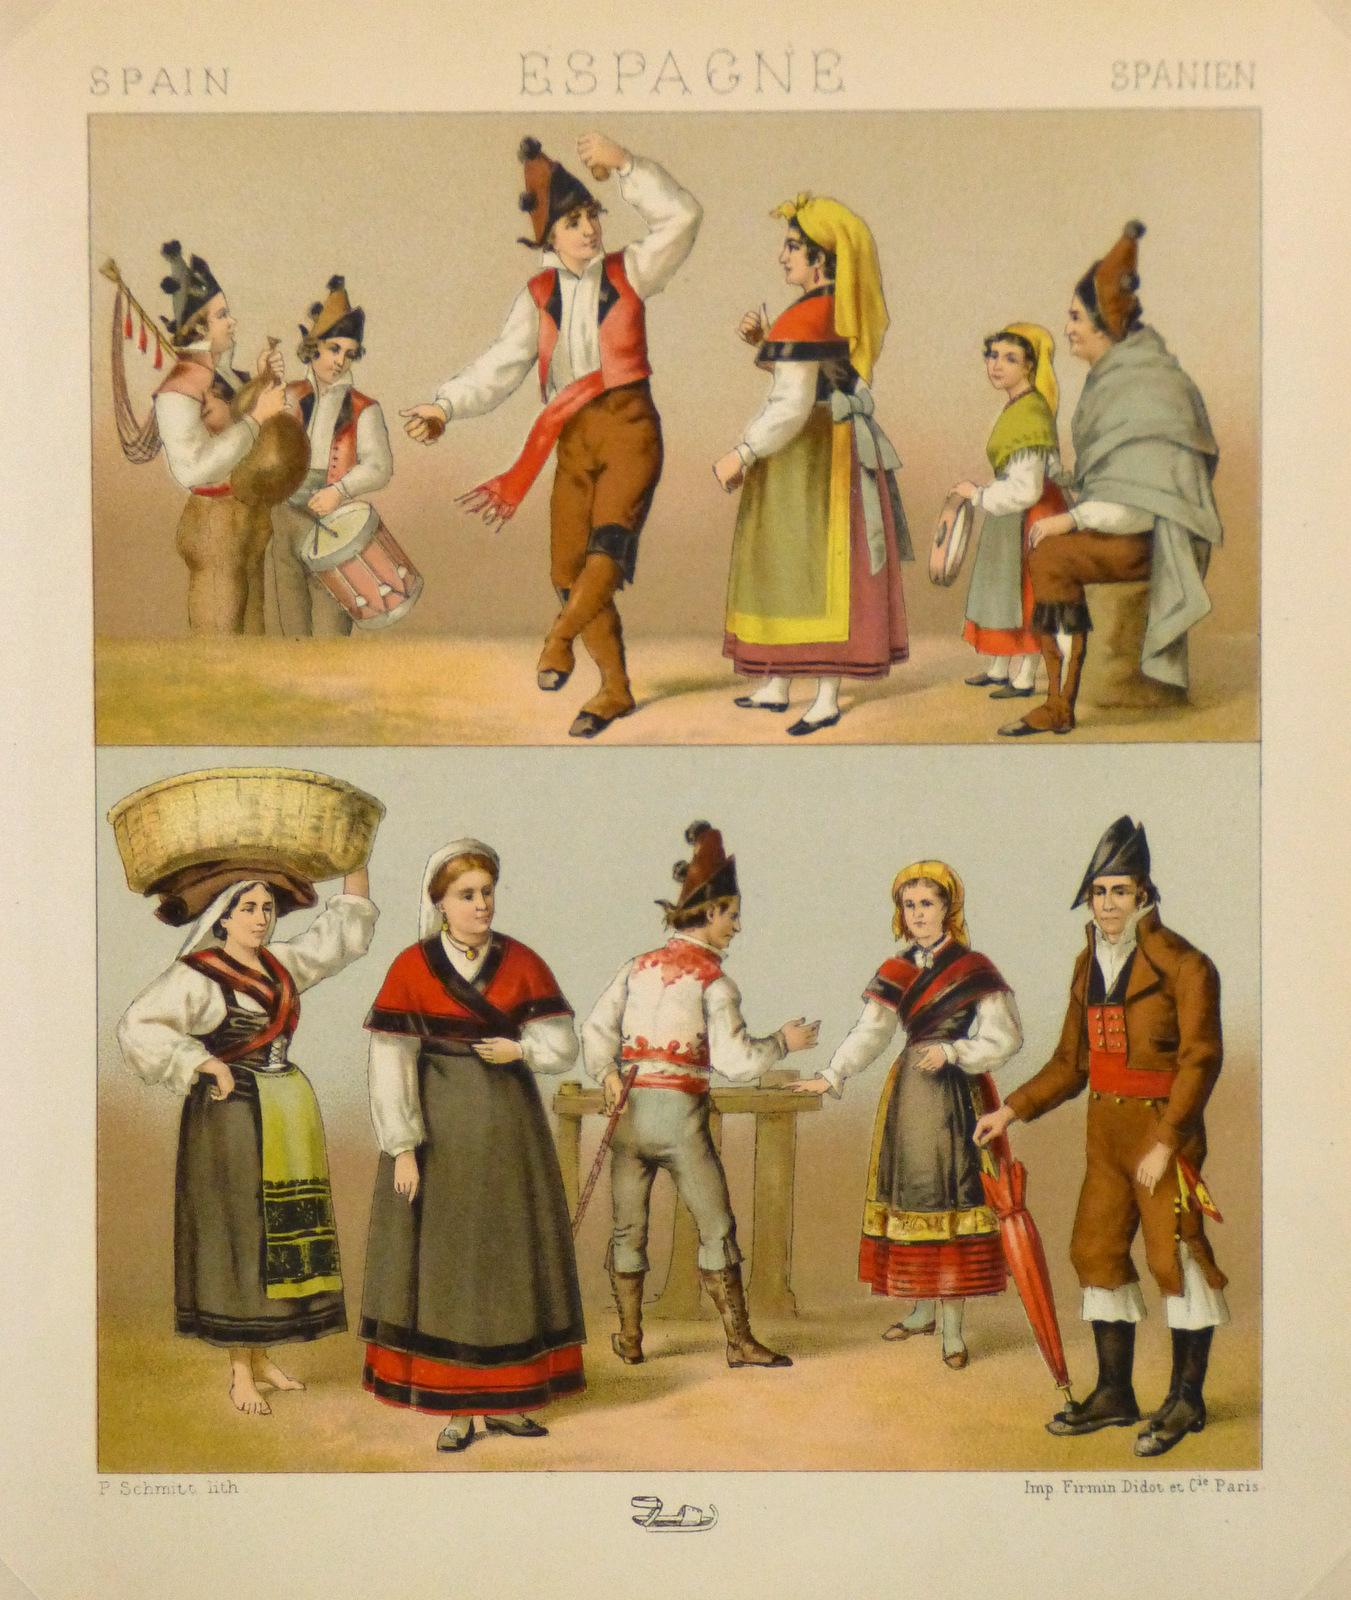 Clothing of Galicia Spain Print, 1888-main-8171K